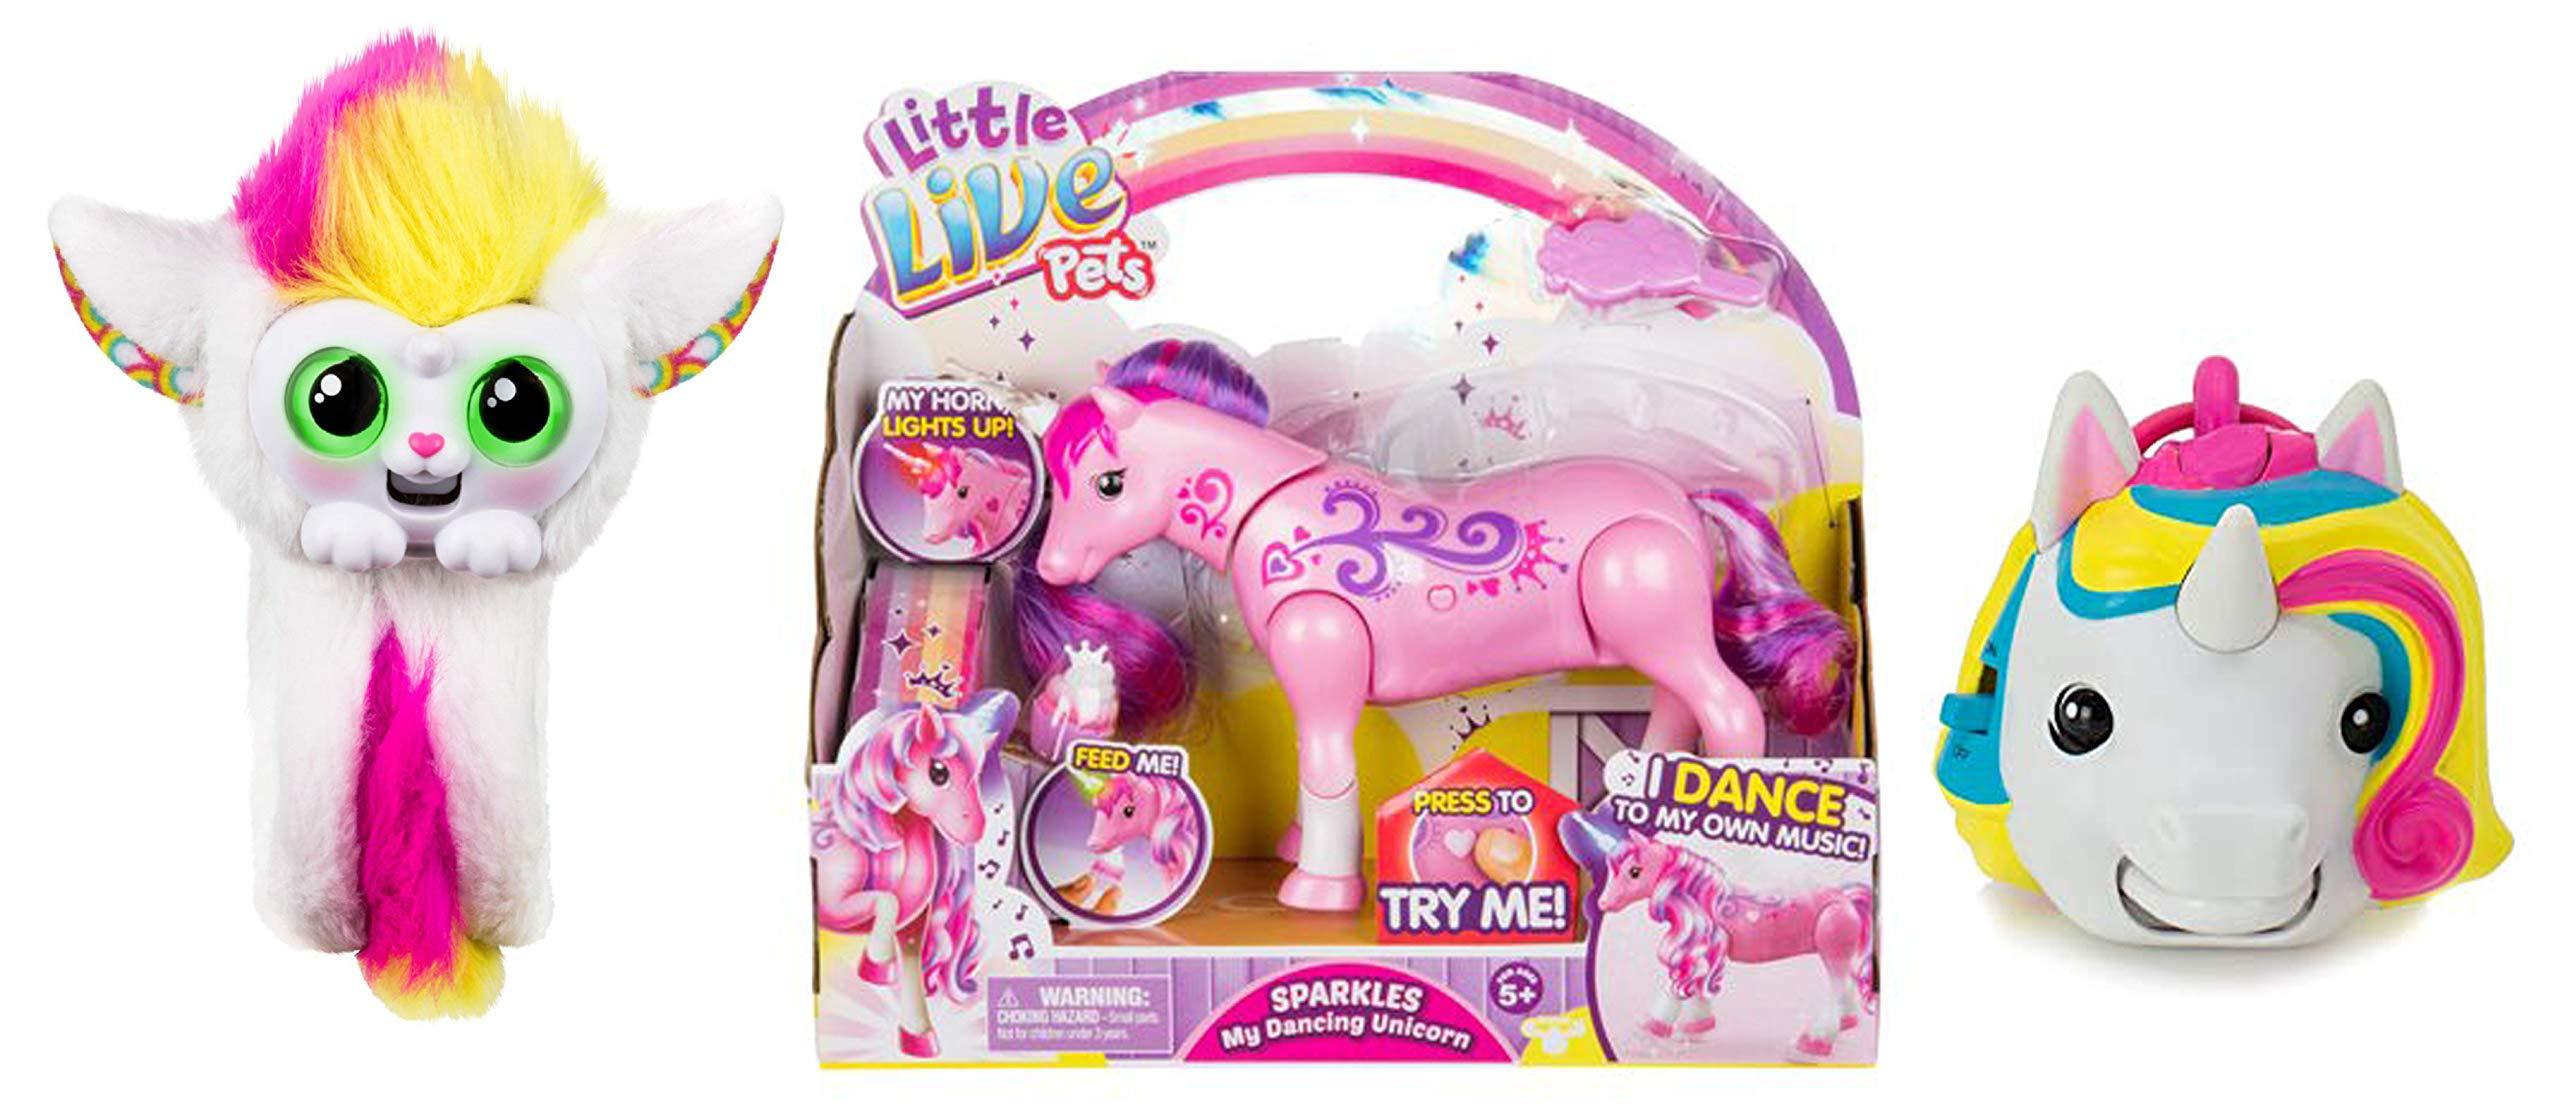 Mojimoto Little Live Wrapples – UNA, Sparkles My Dancing Unicorn, Unicorn Repeating Talk Back Toy 3